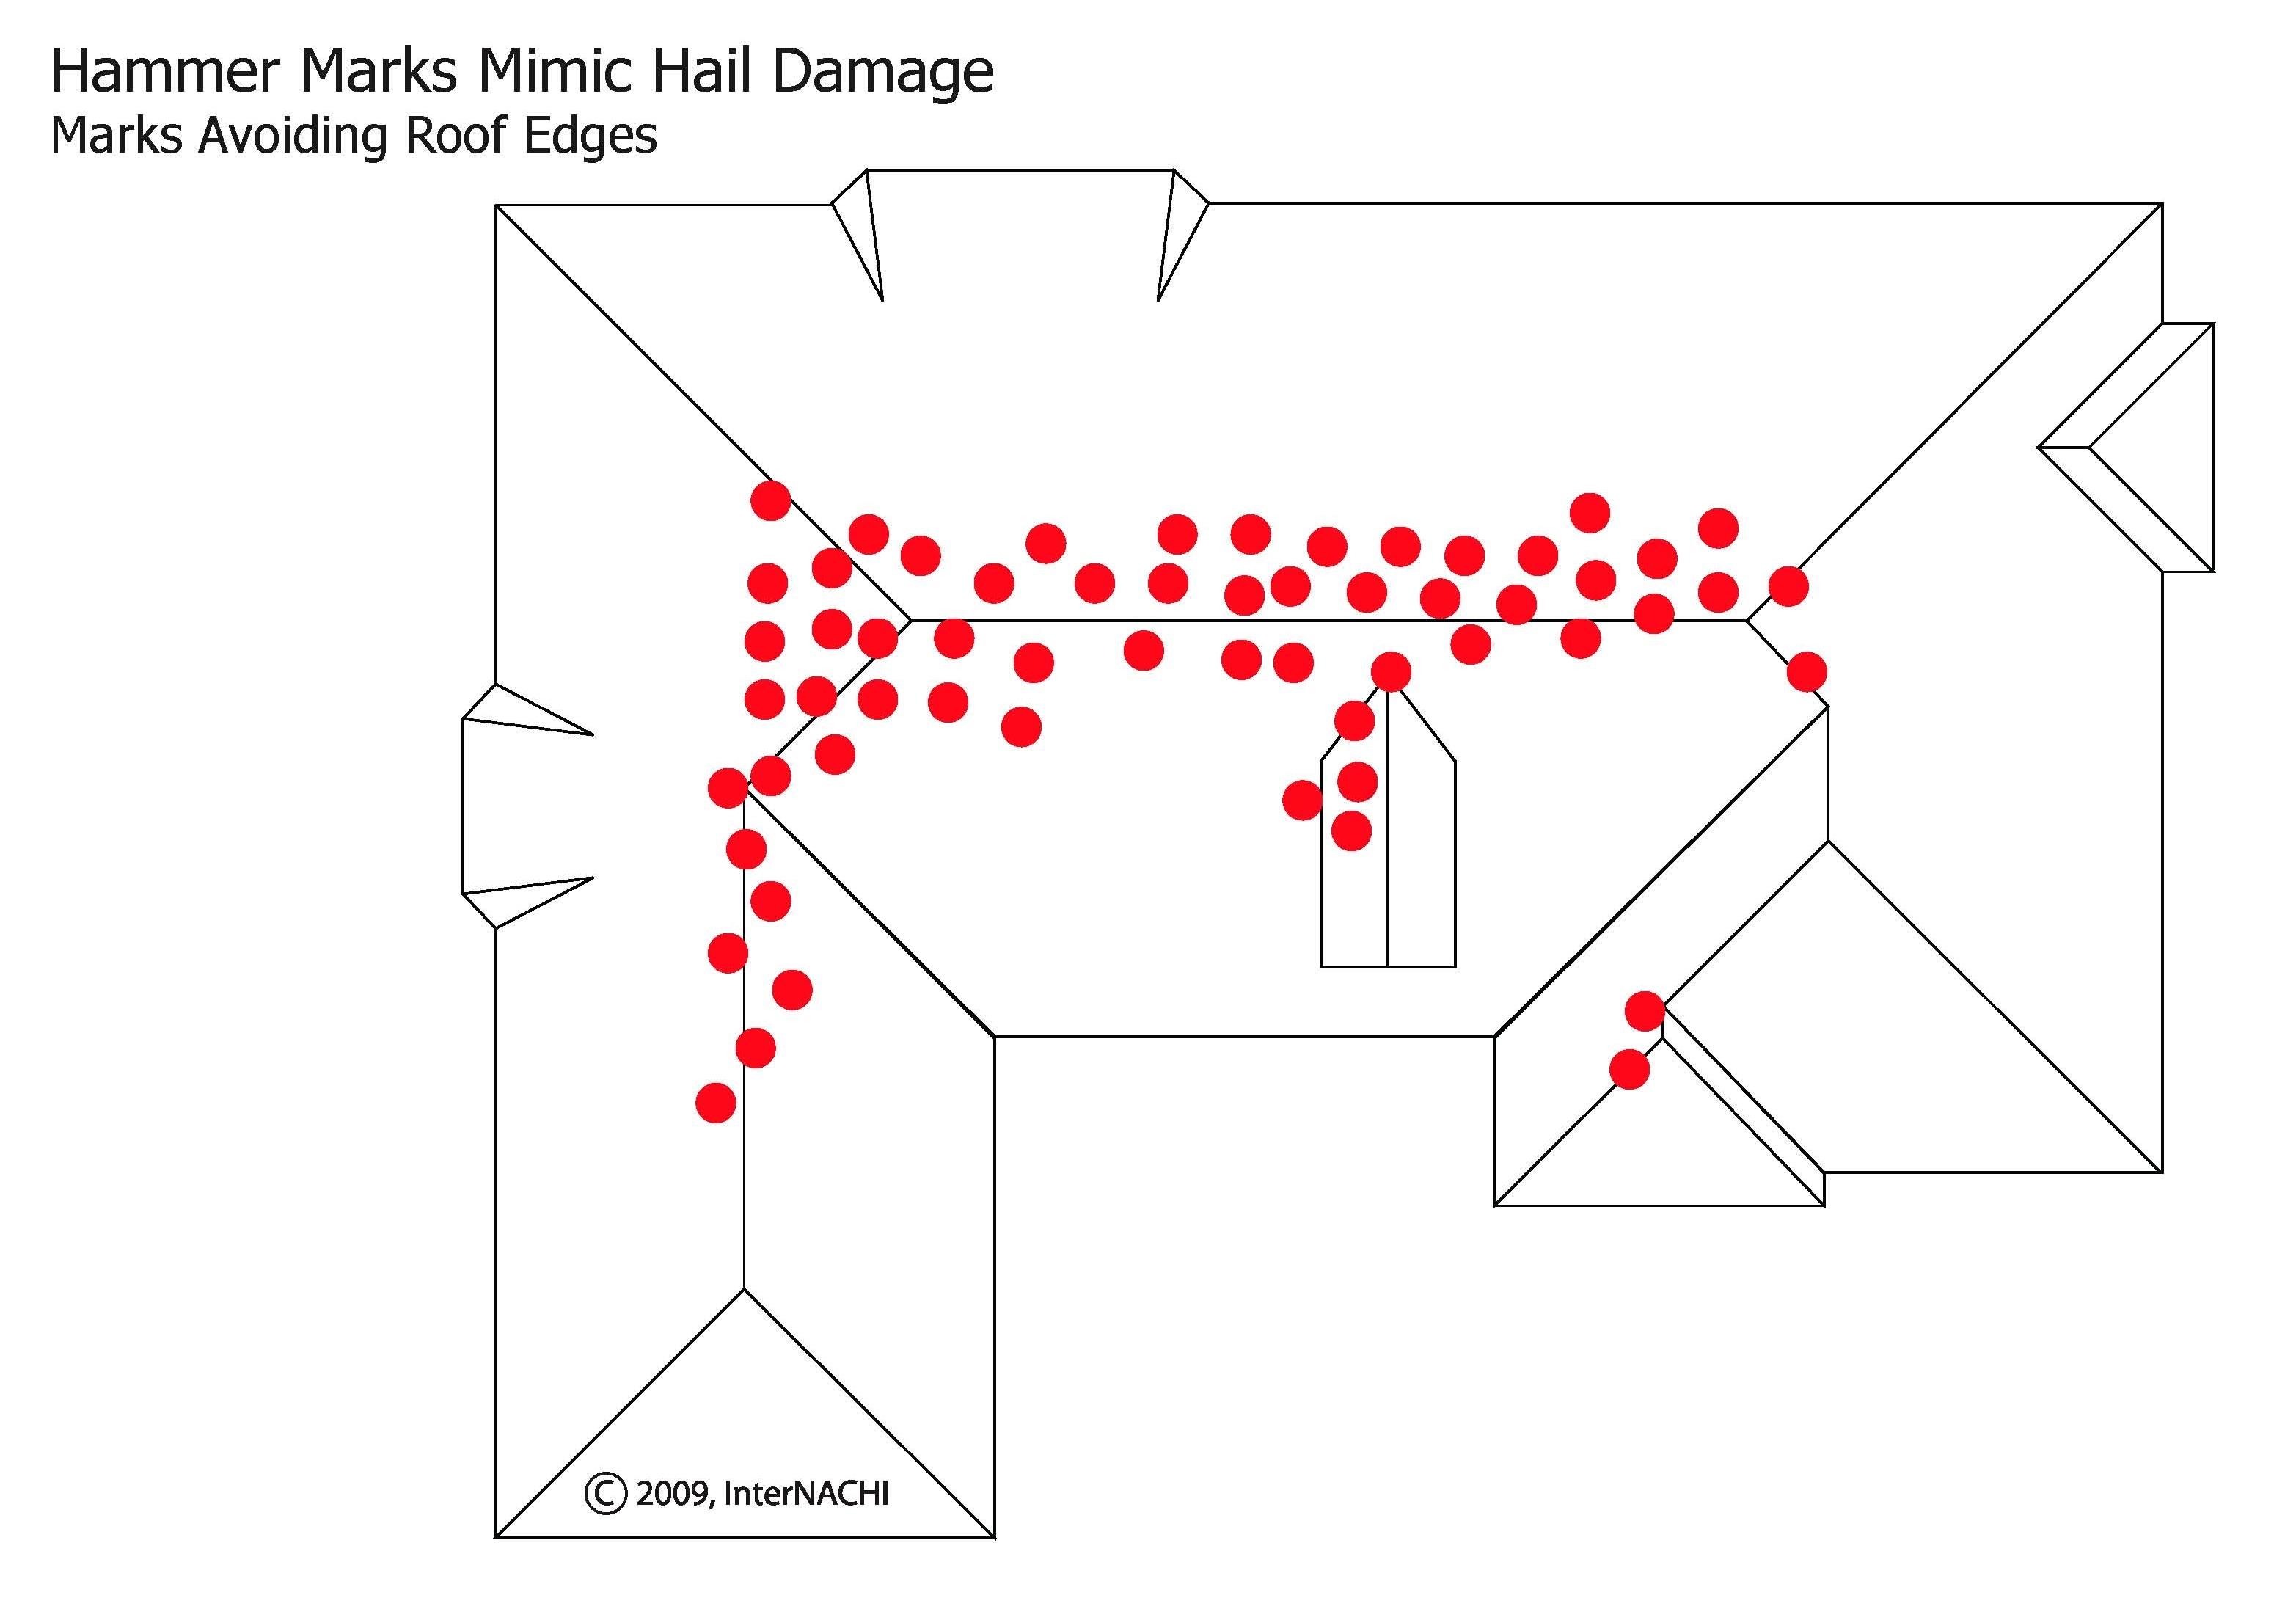 Hammer marks avoid the edge of the roof.